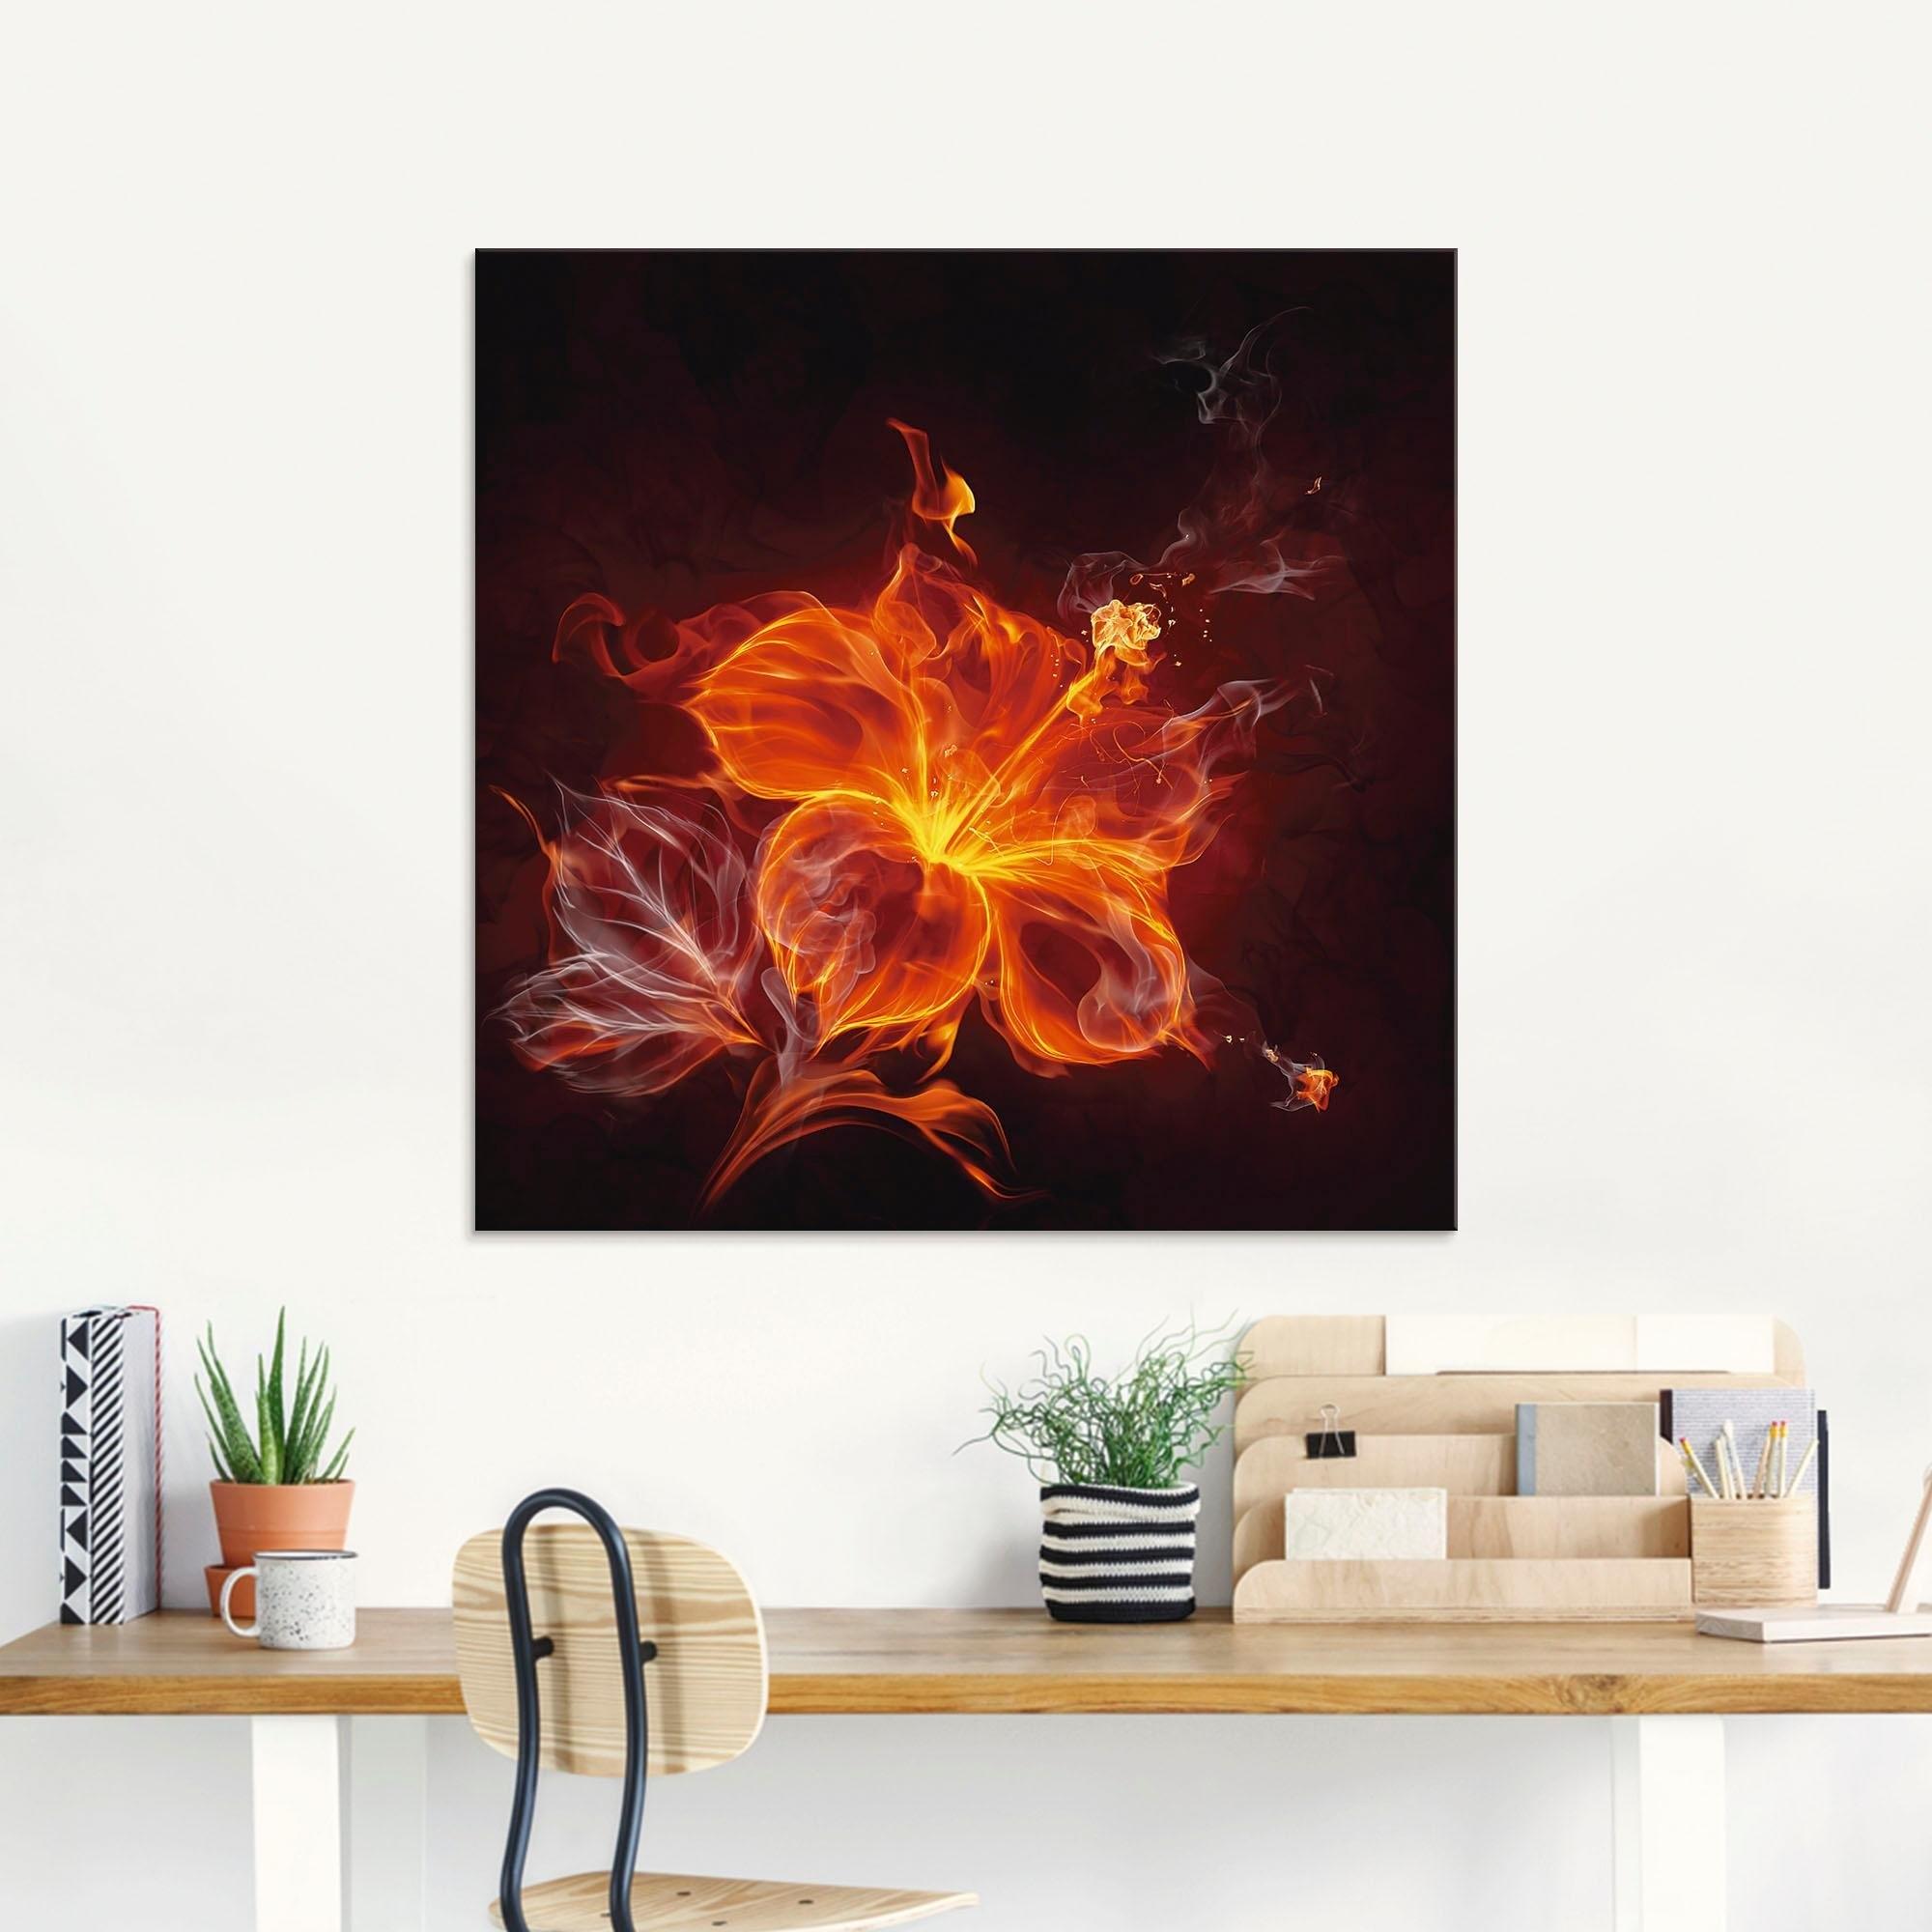 Artland print op glas »Feuerblume« goedkoop op otto.nl kopen